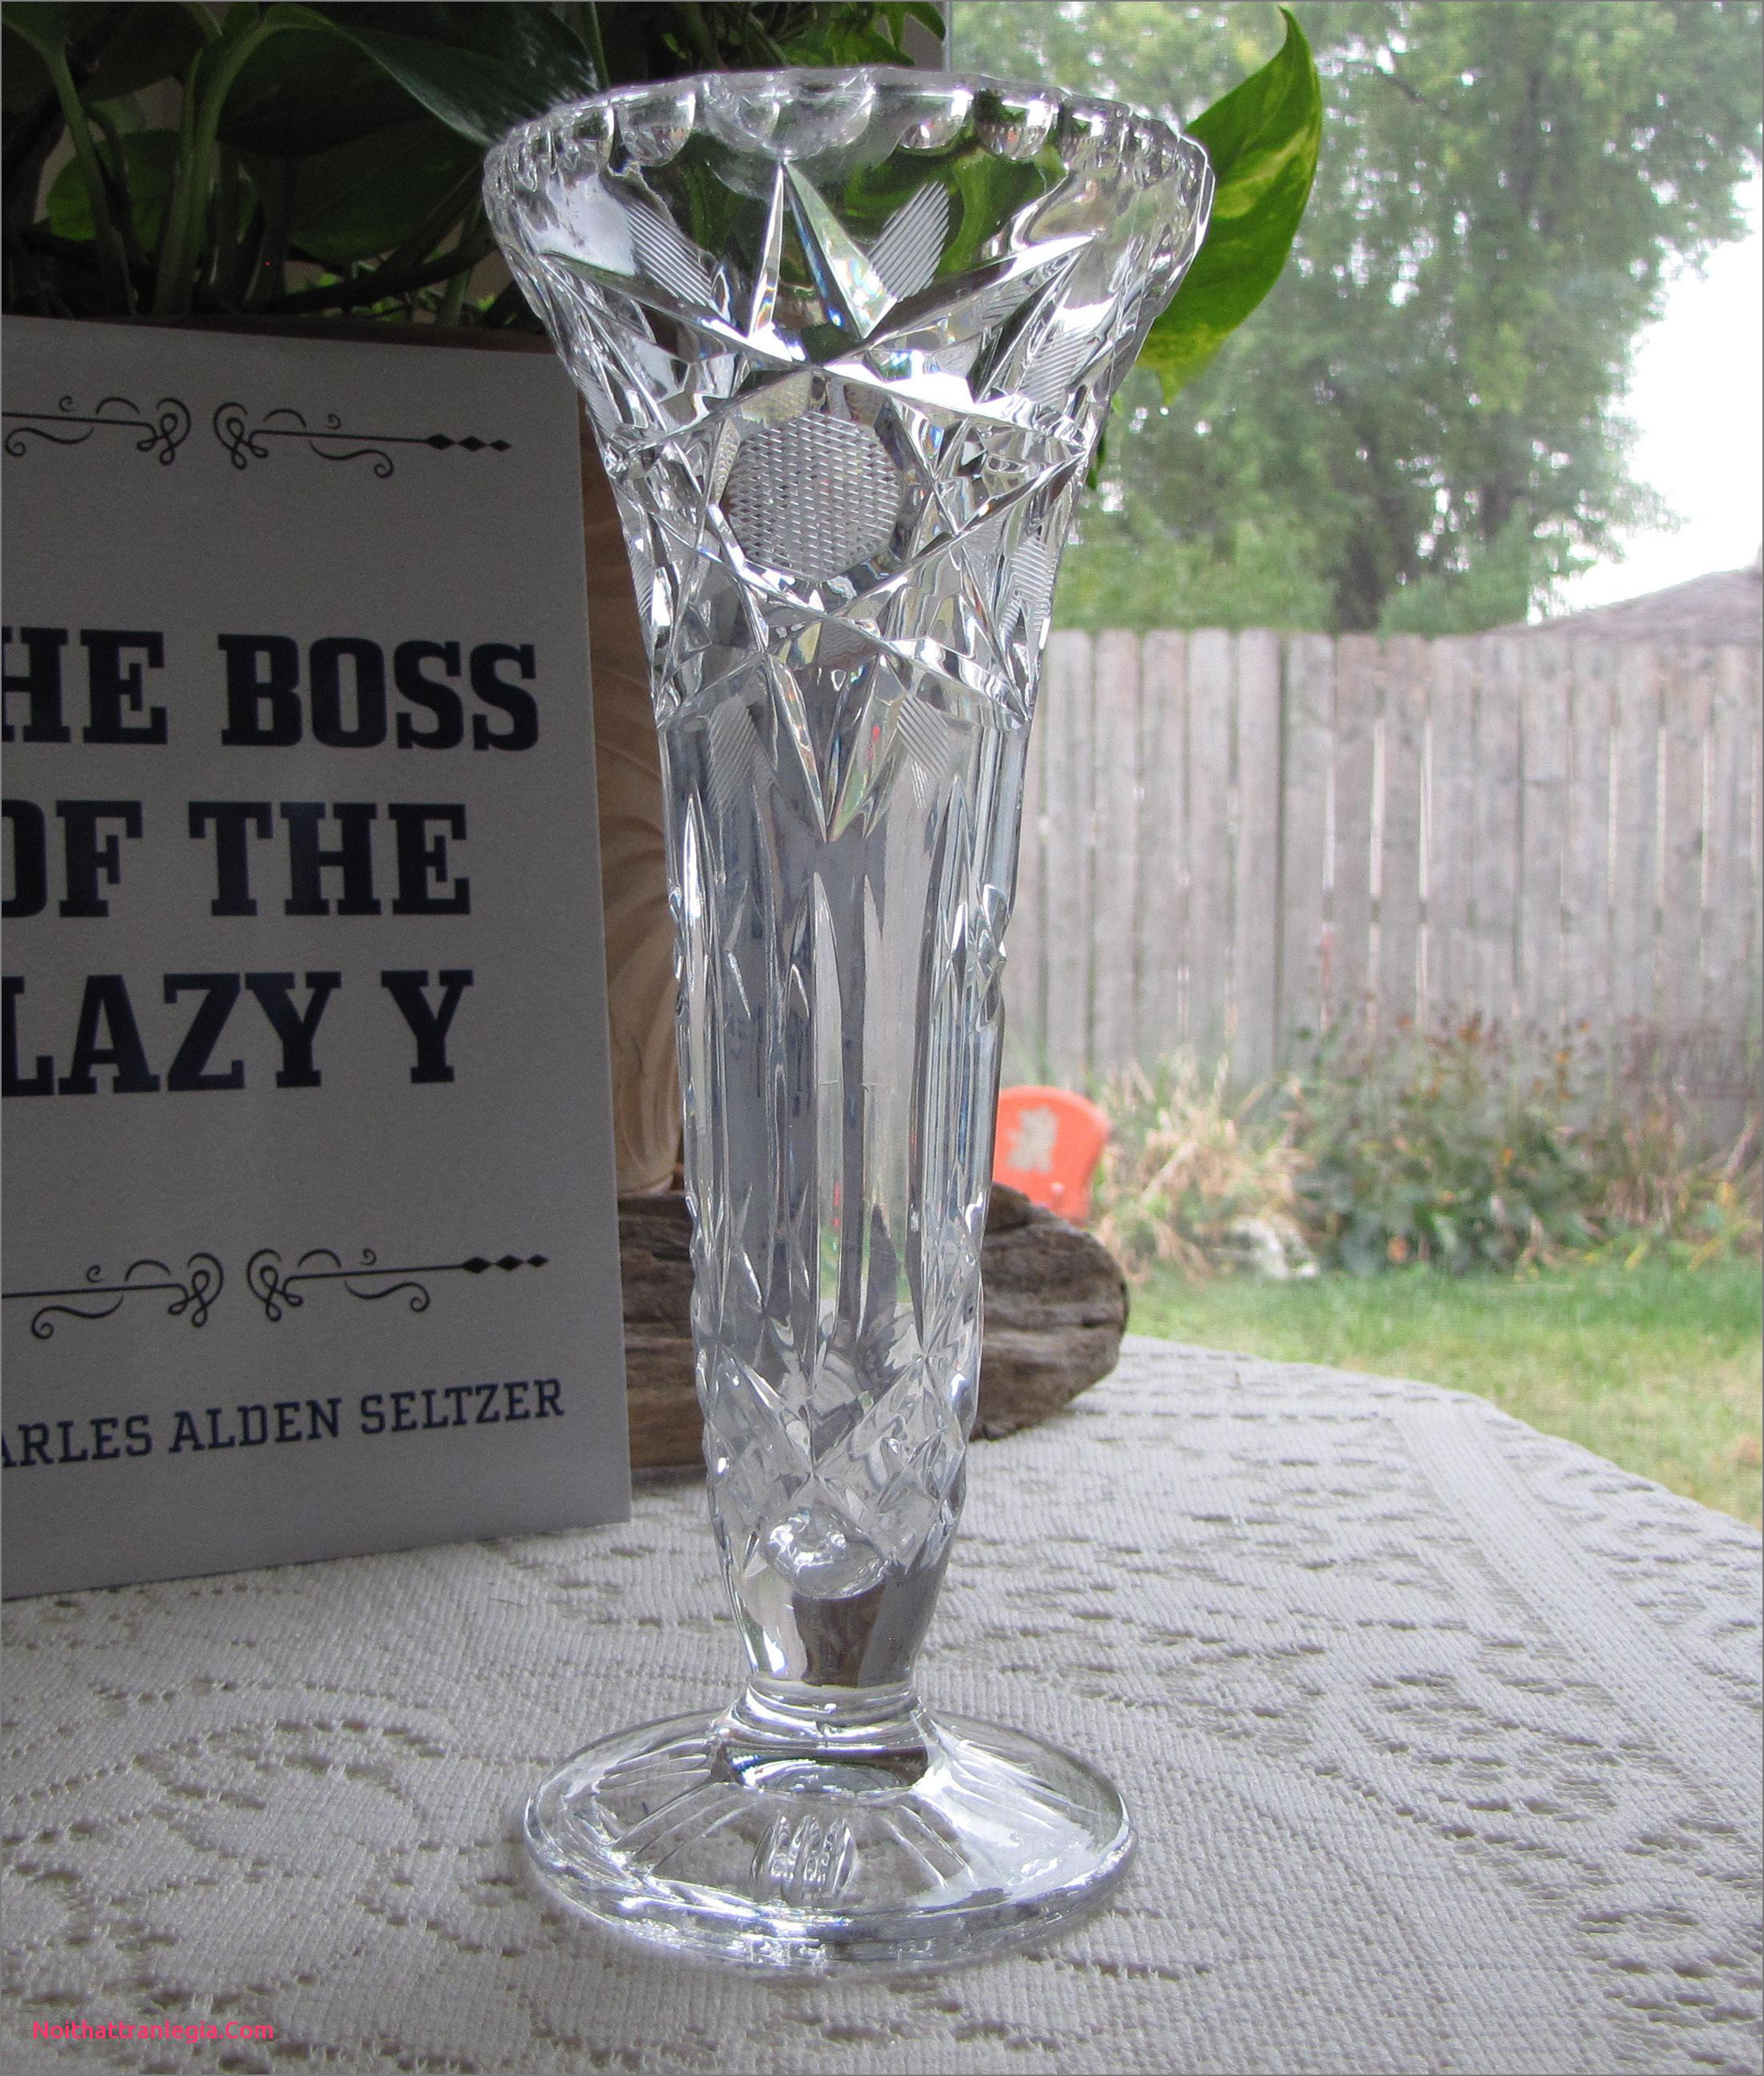 extra large martini glass vase of 20 cut glass antique vase noithattranlegia vases design inside gallery photo gallery photo gallery photo crystal vase cut glass